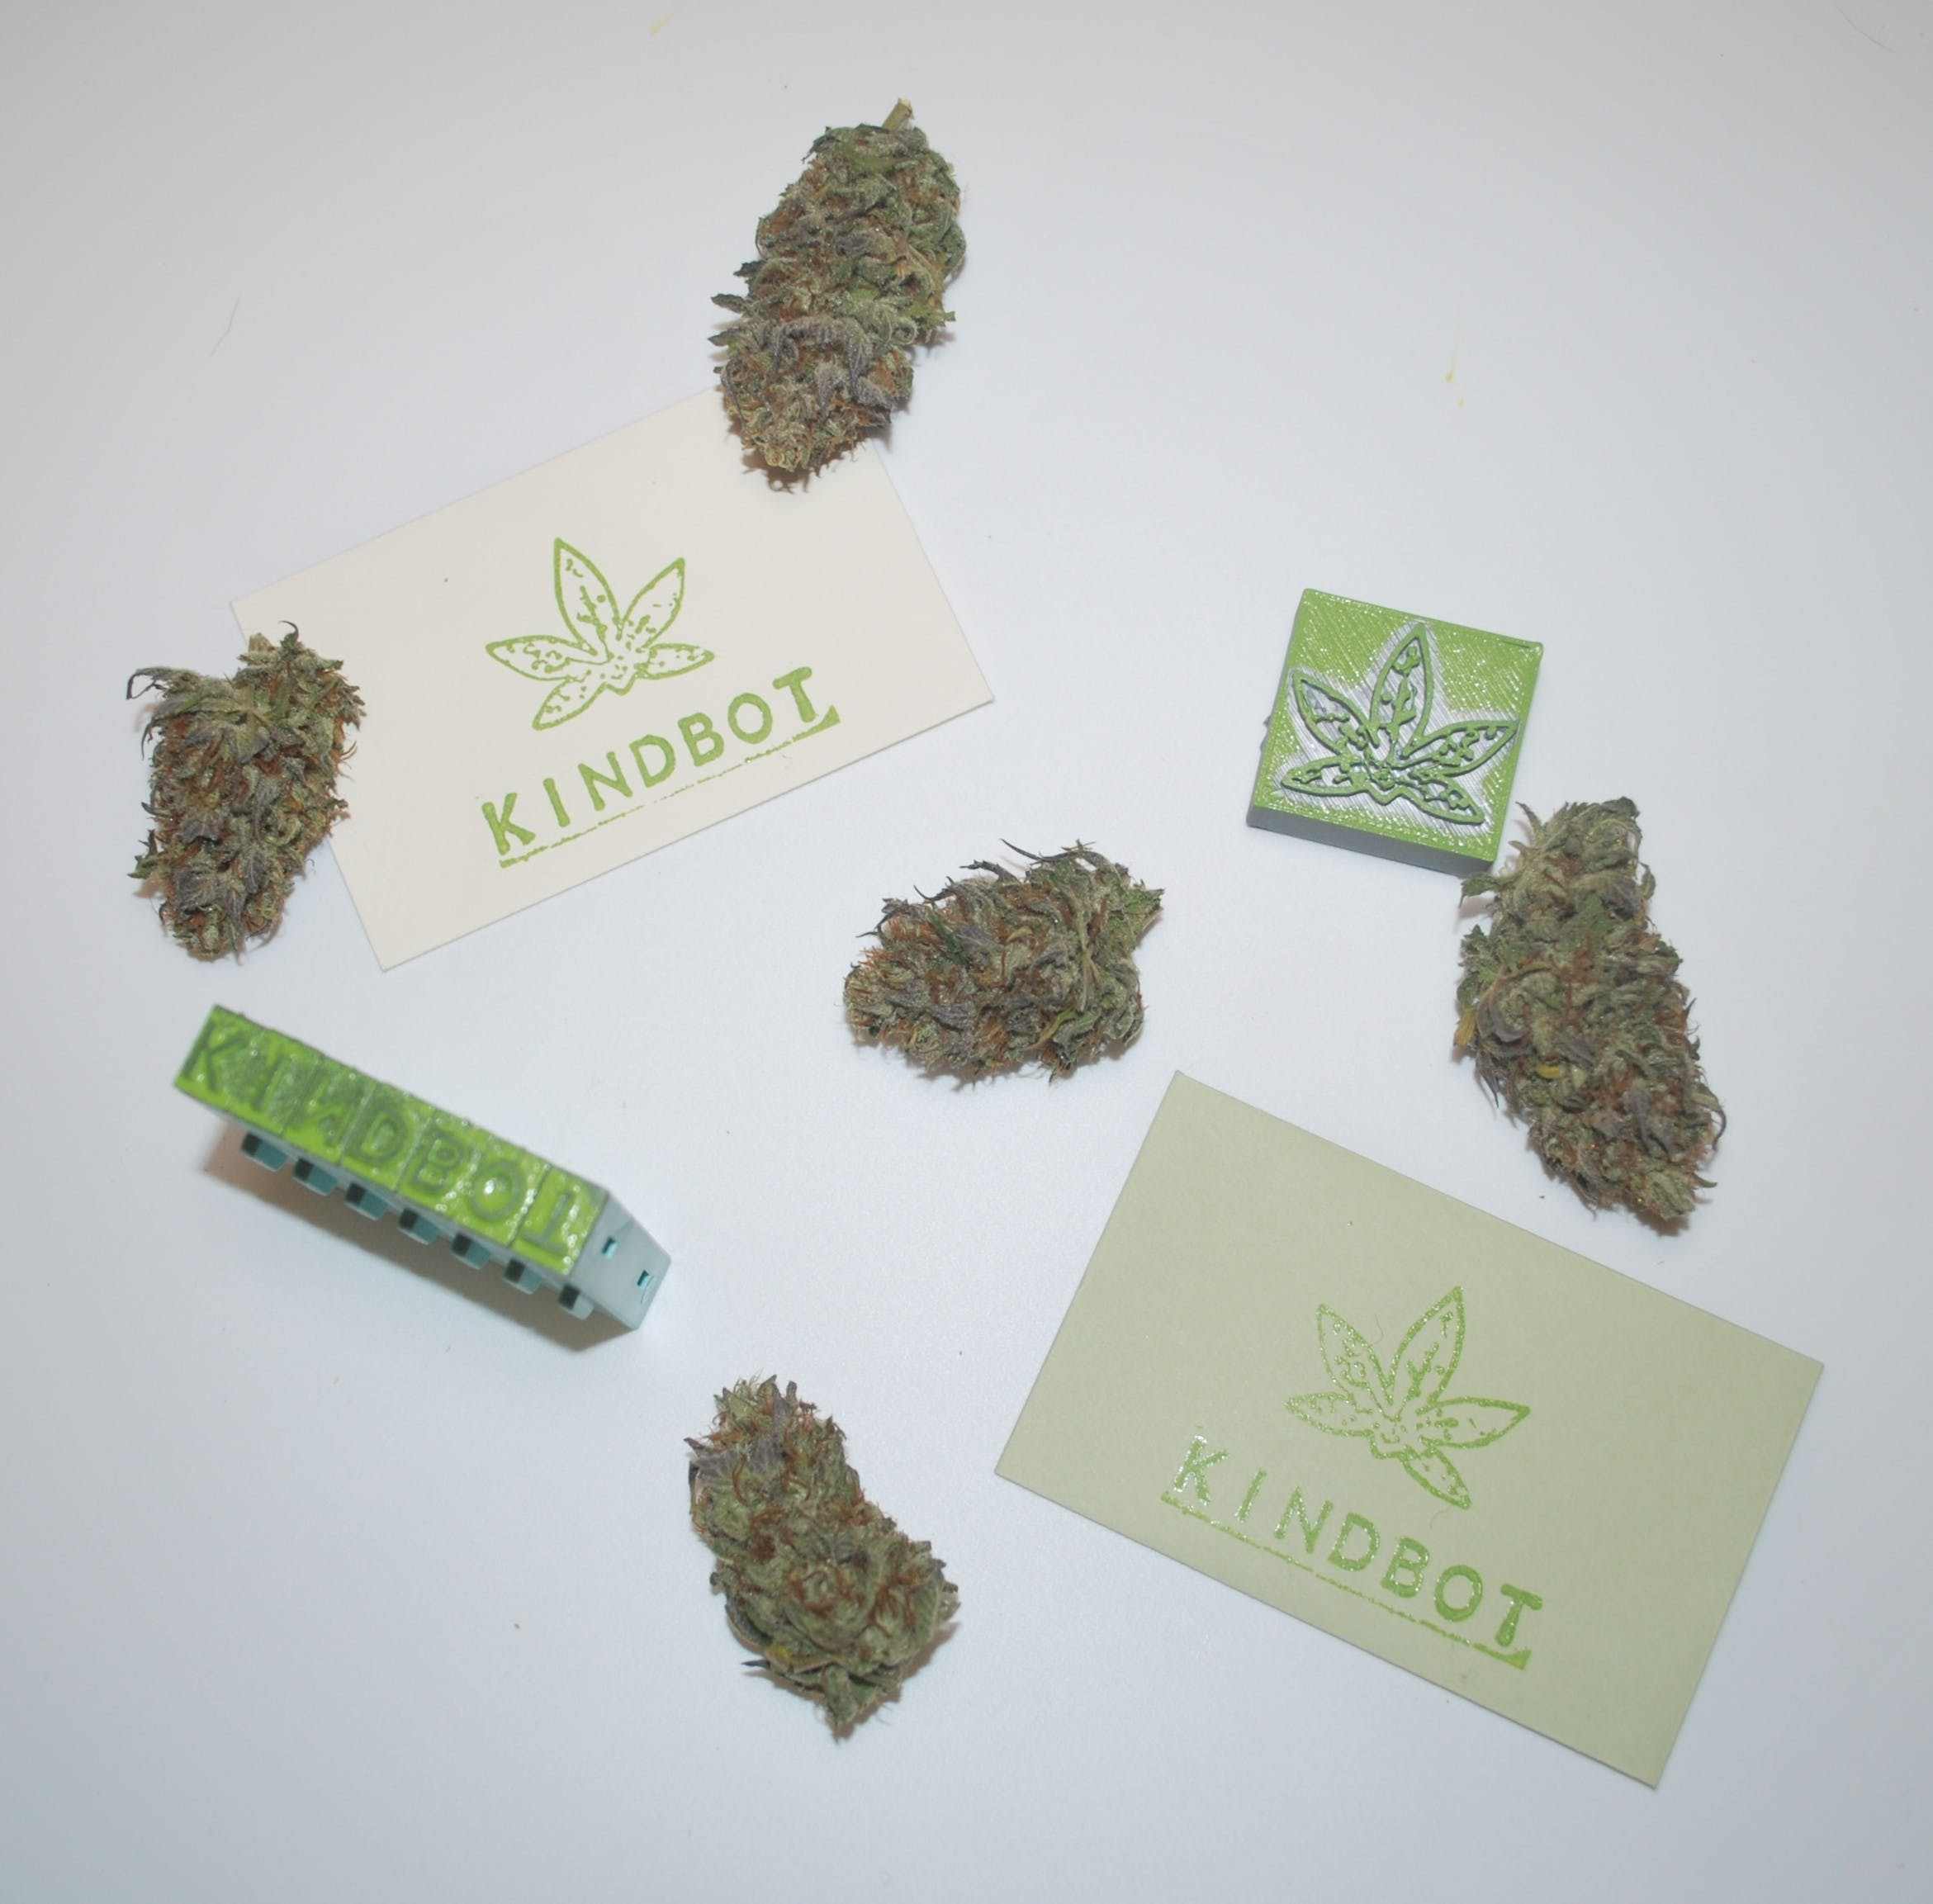 Did someone say organic, pesticide-free weed?